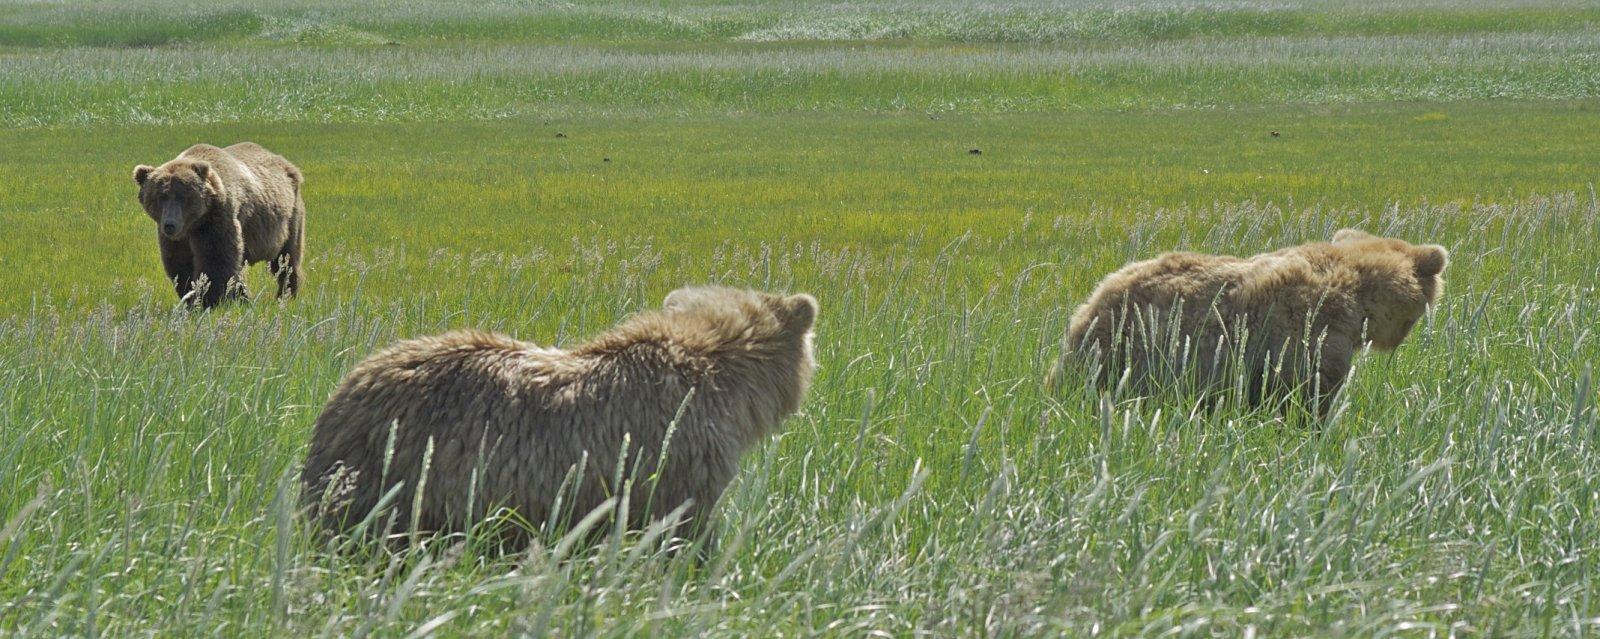 Click image for larger version  Name:Brown Bears, Hallo Bay, Katmai NP.jpg Views:48 Size:271.5 KB ID:199041